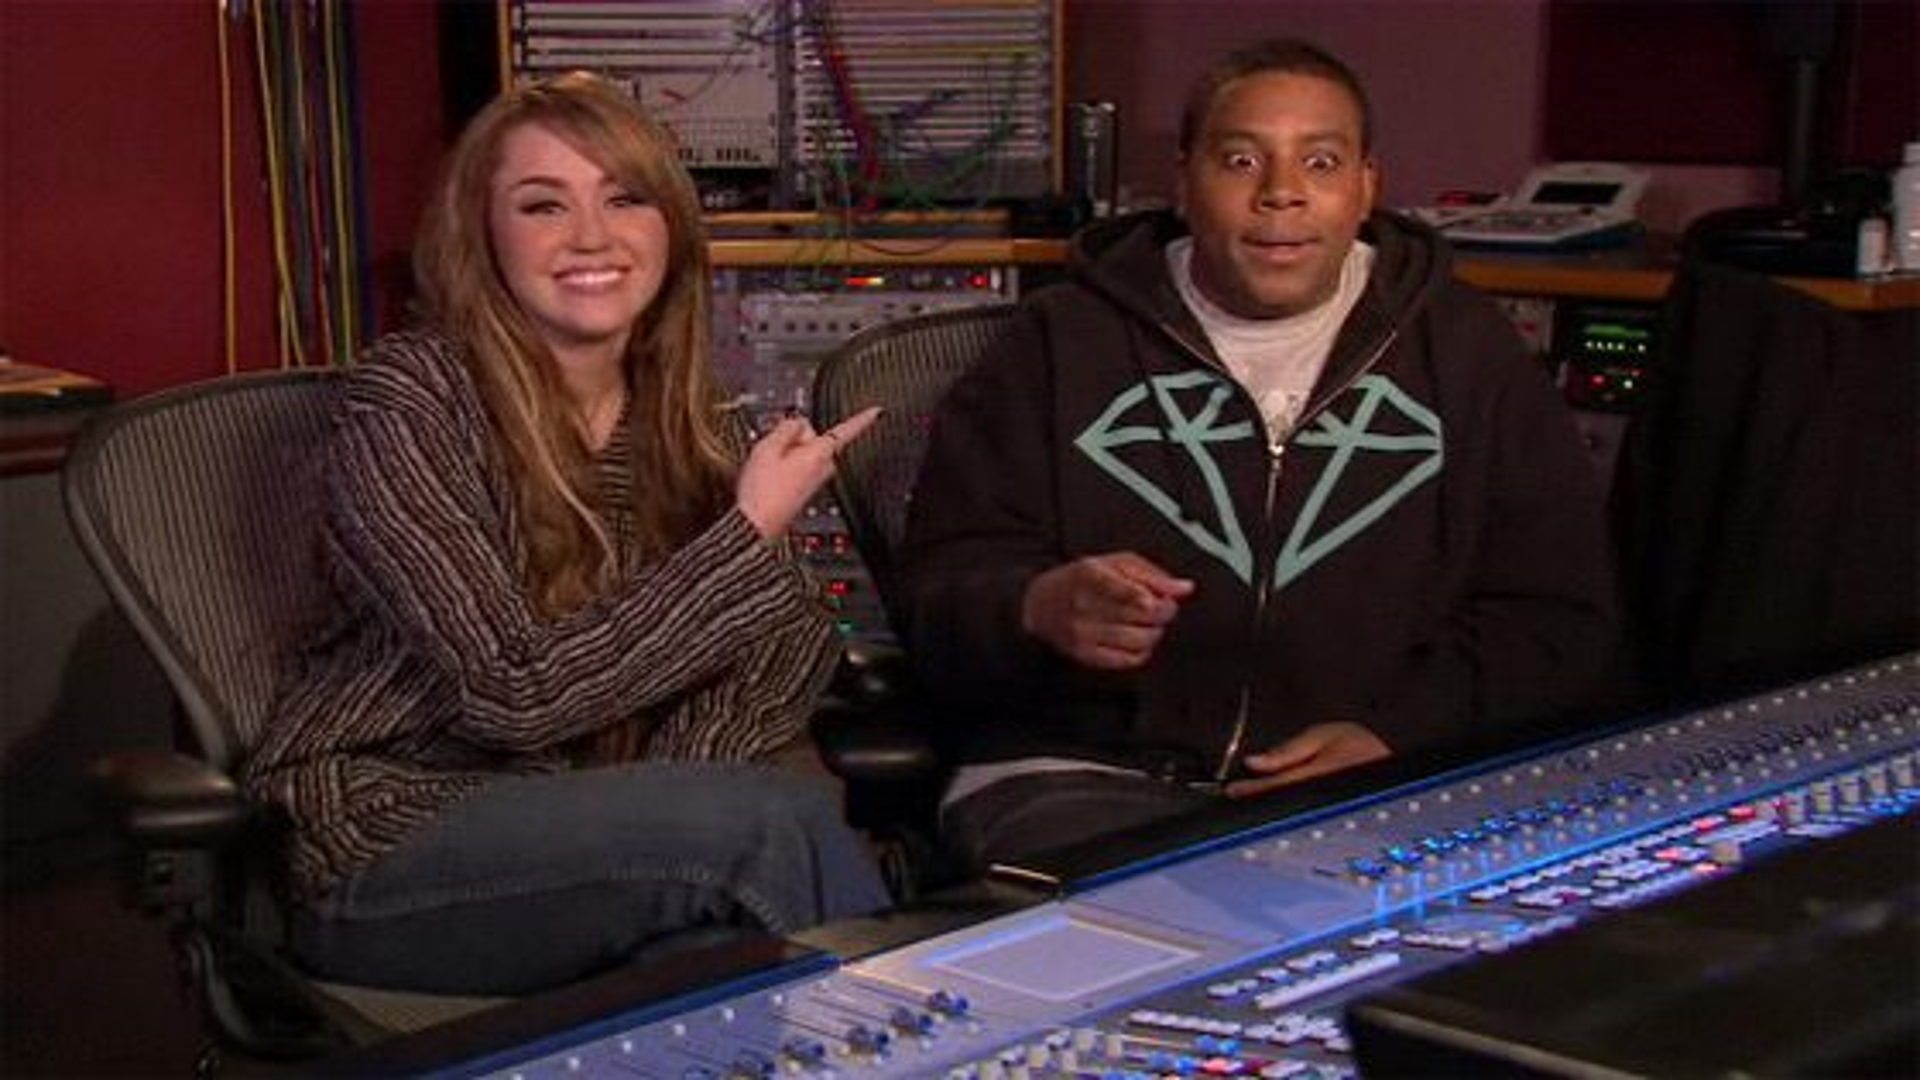 Miley-Cyrus-SNL-Promo